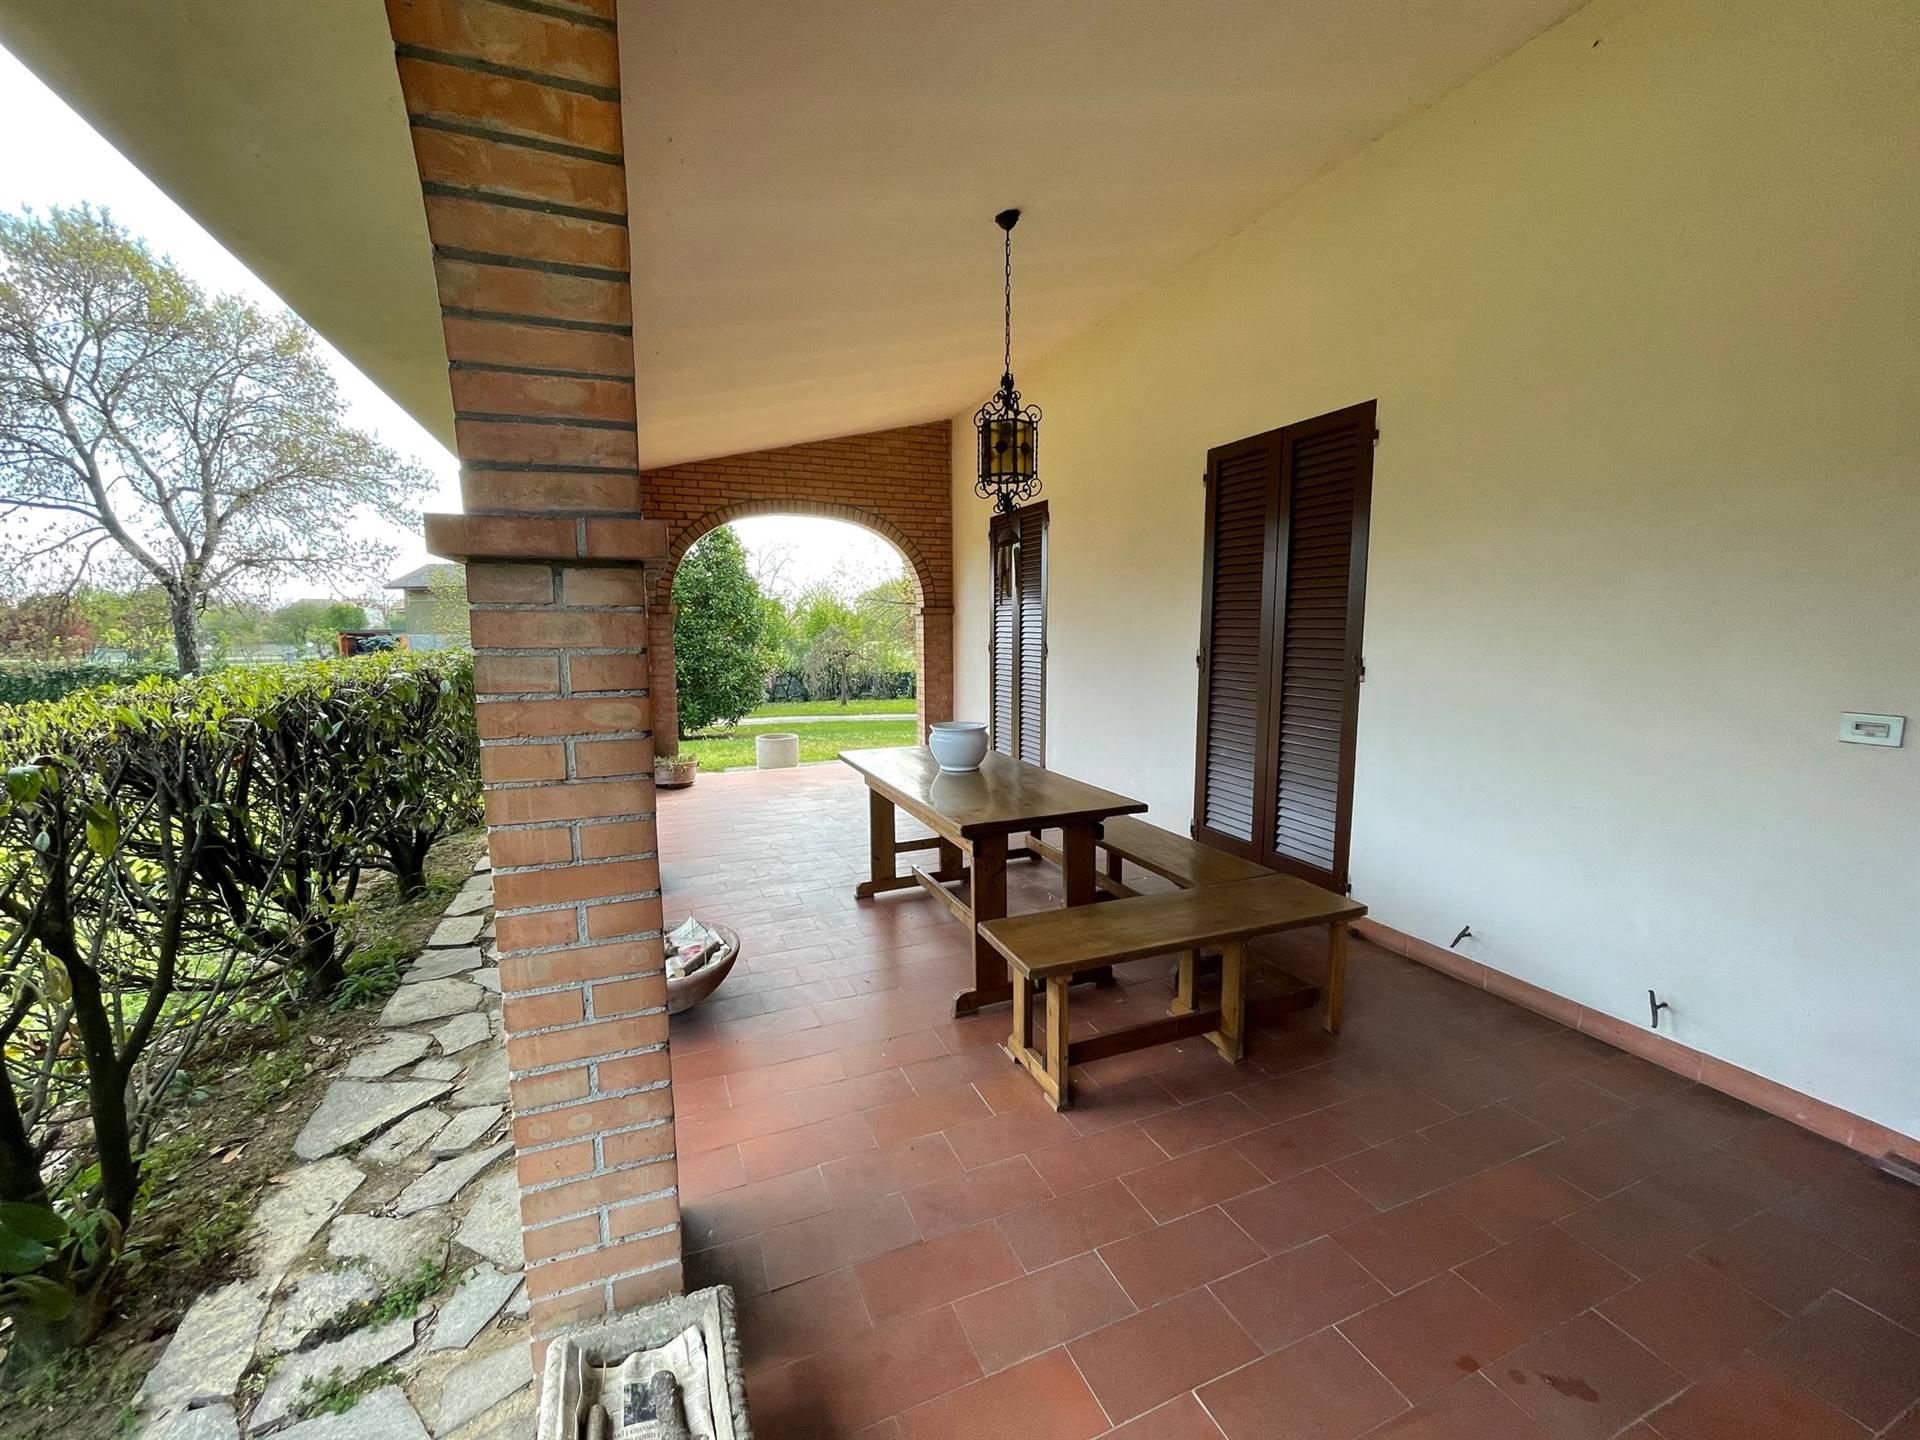 portico villa vendita Mestre Zelarino euro 550.000